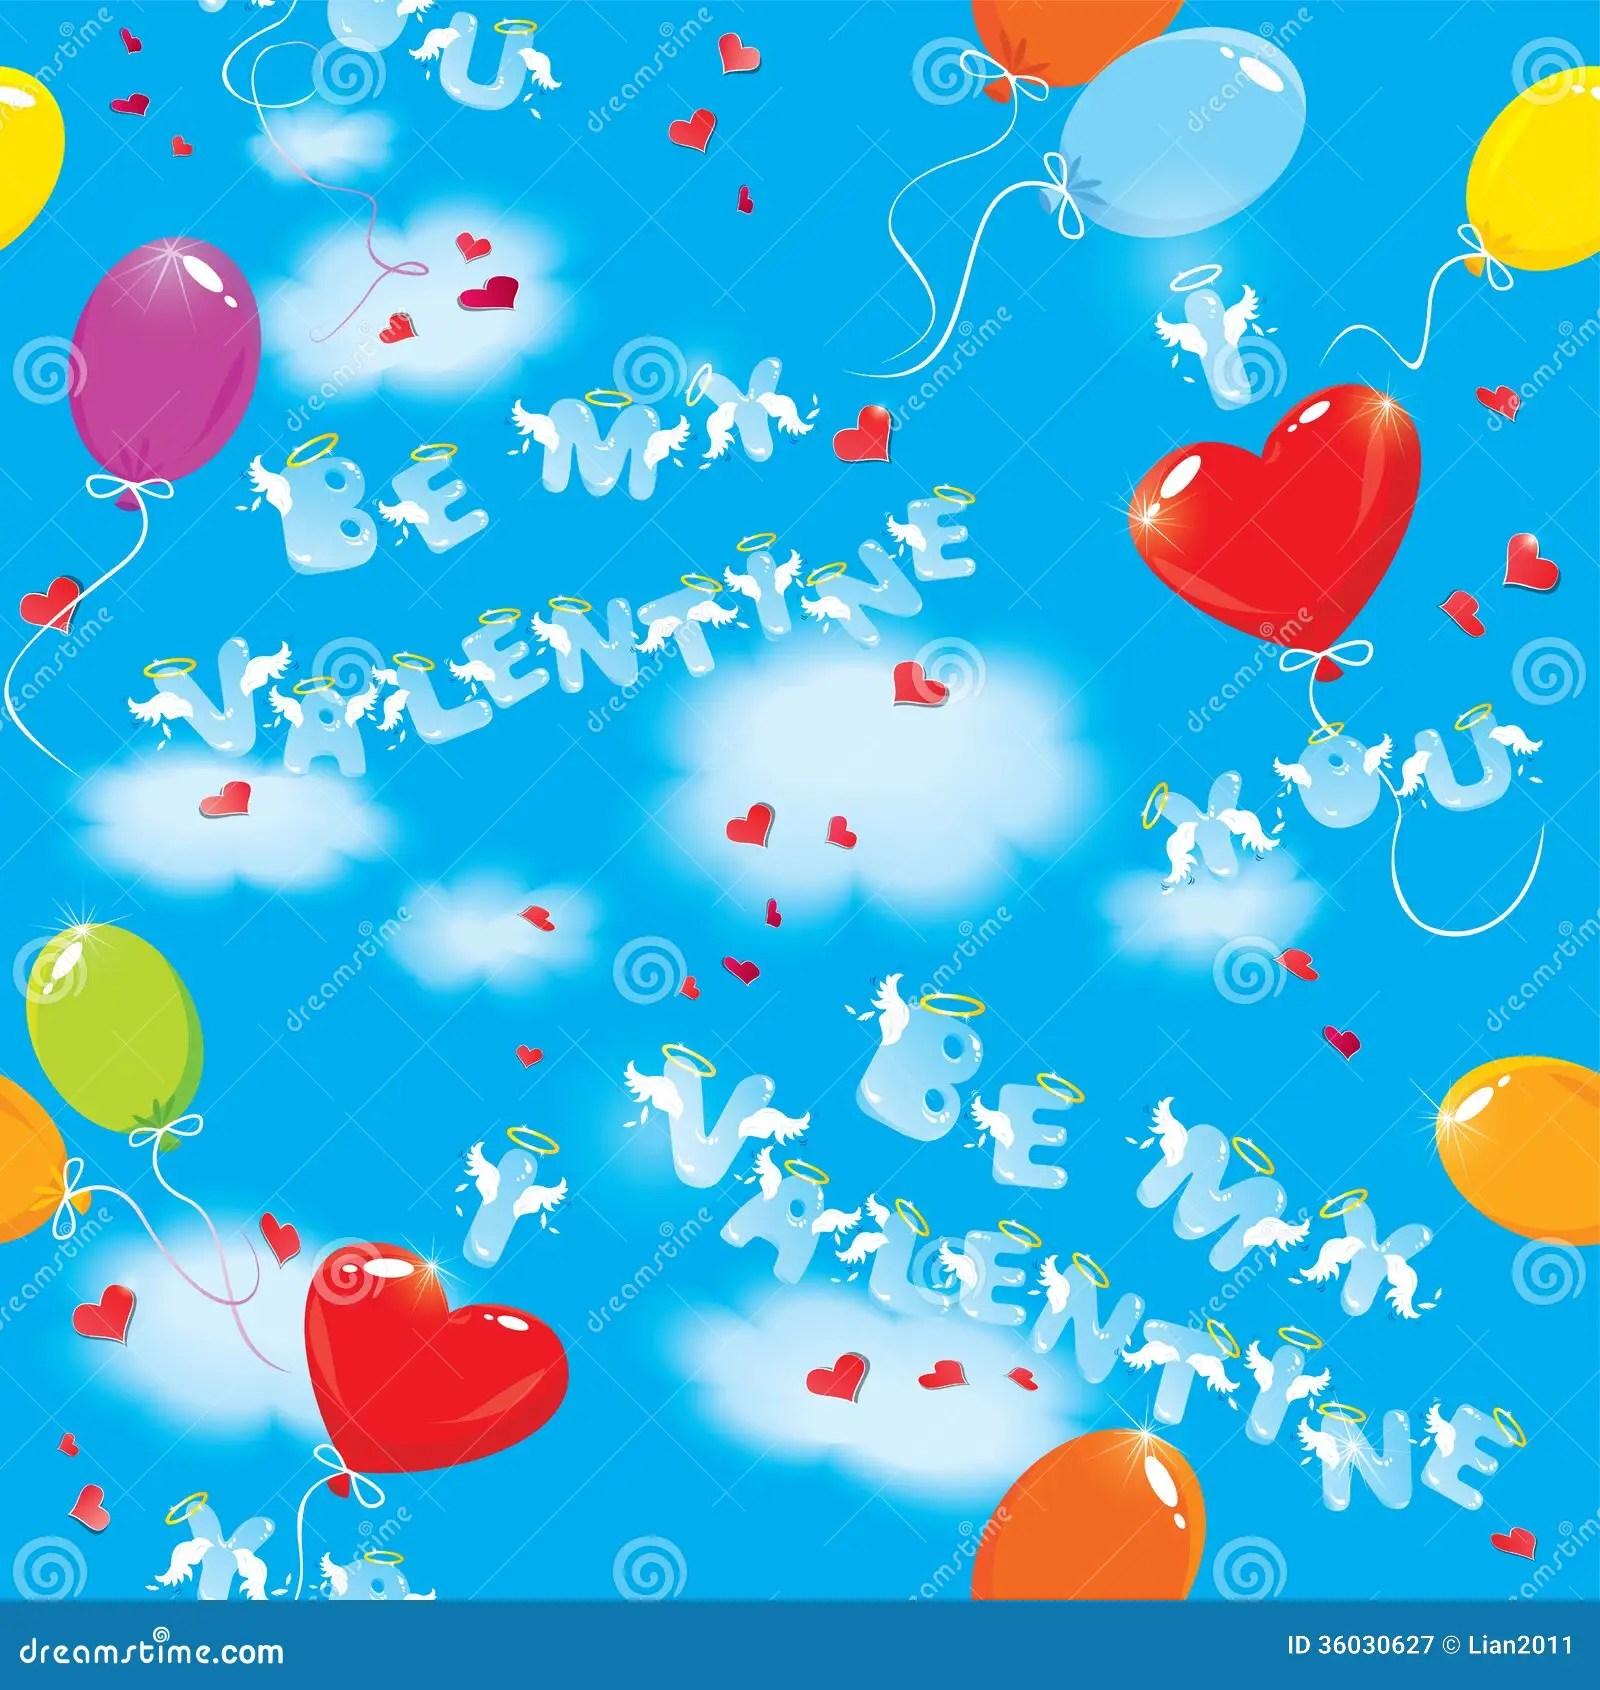 I Love You Background Blue